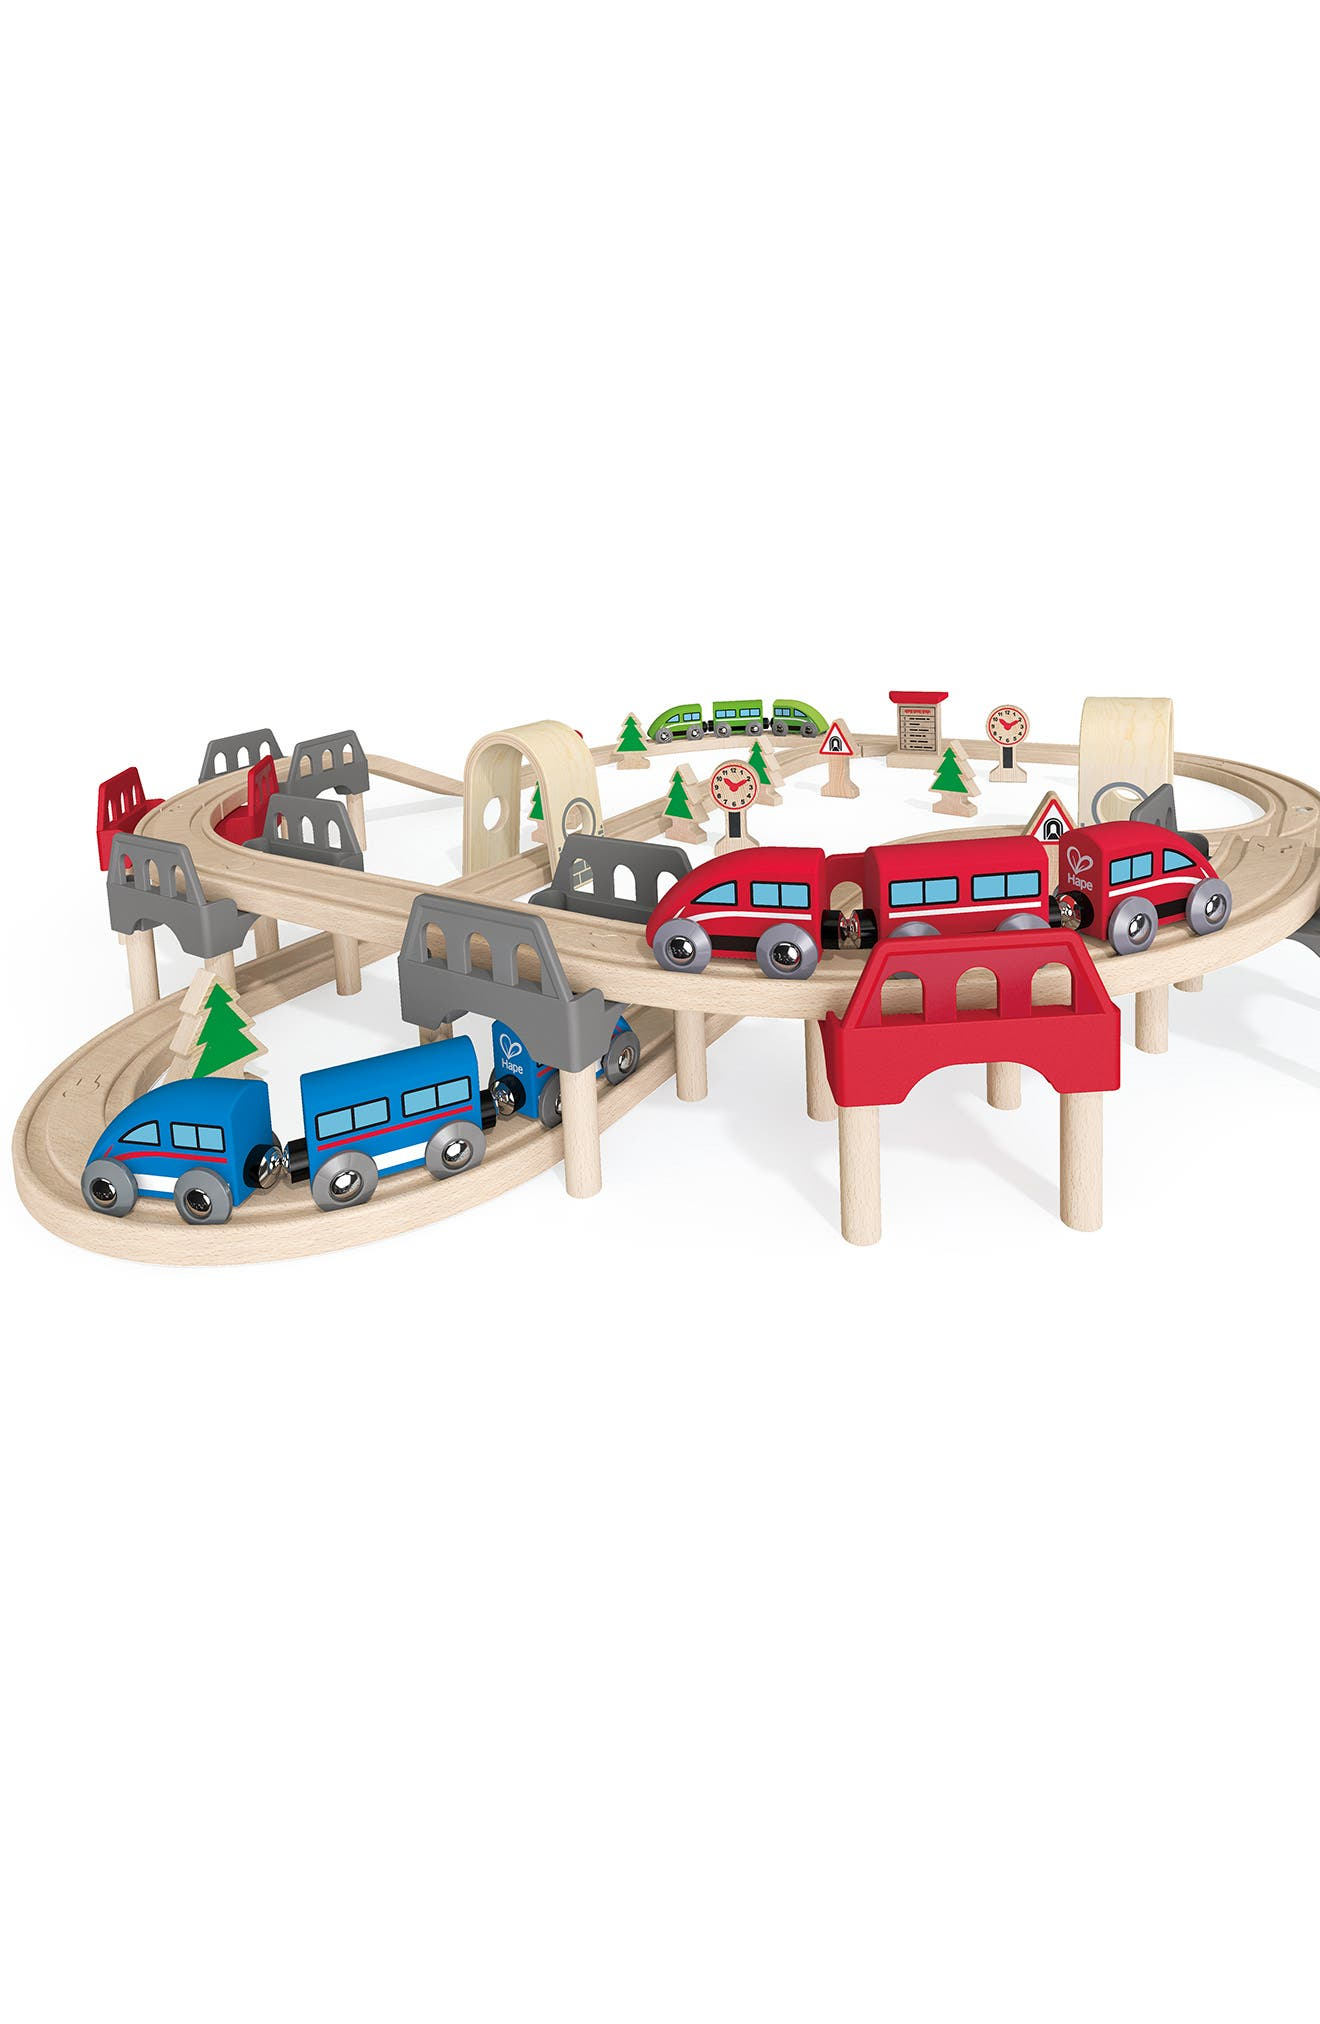 High & Low Railway Set,                             Alternate thumbnail 5, color,                             250